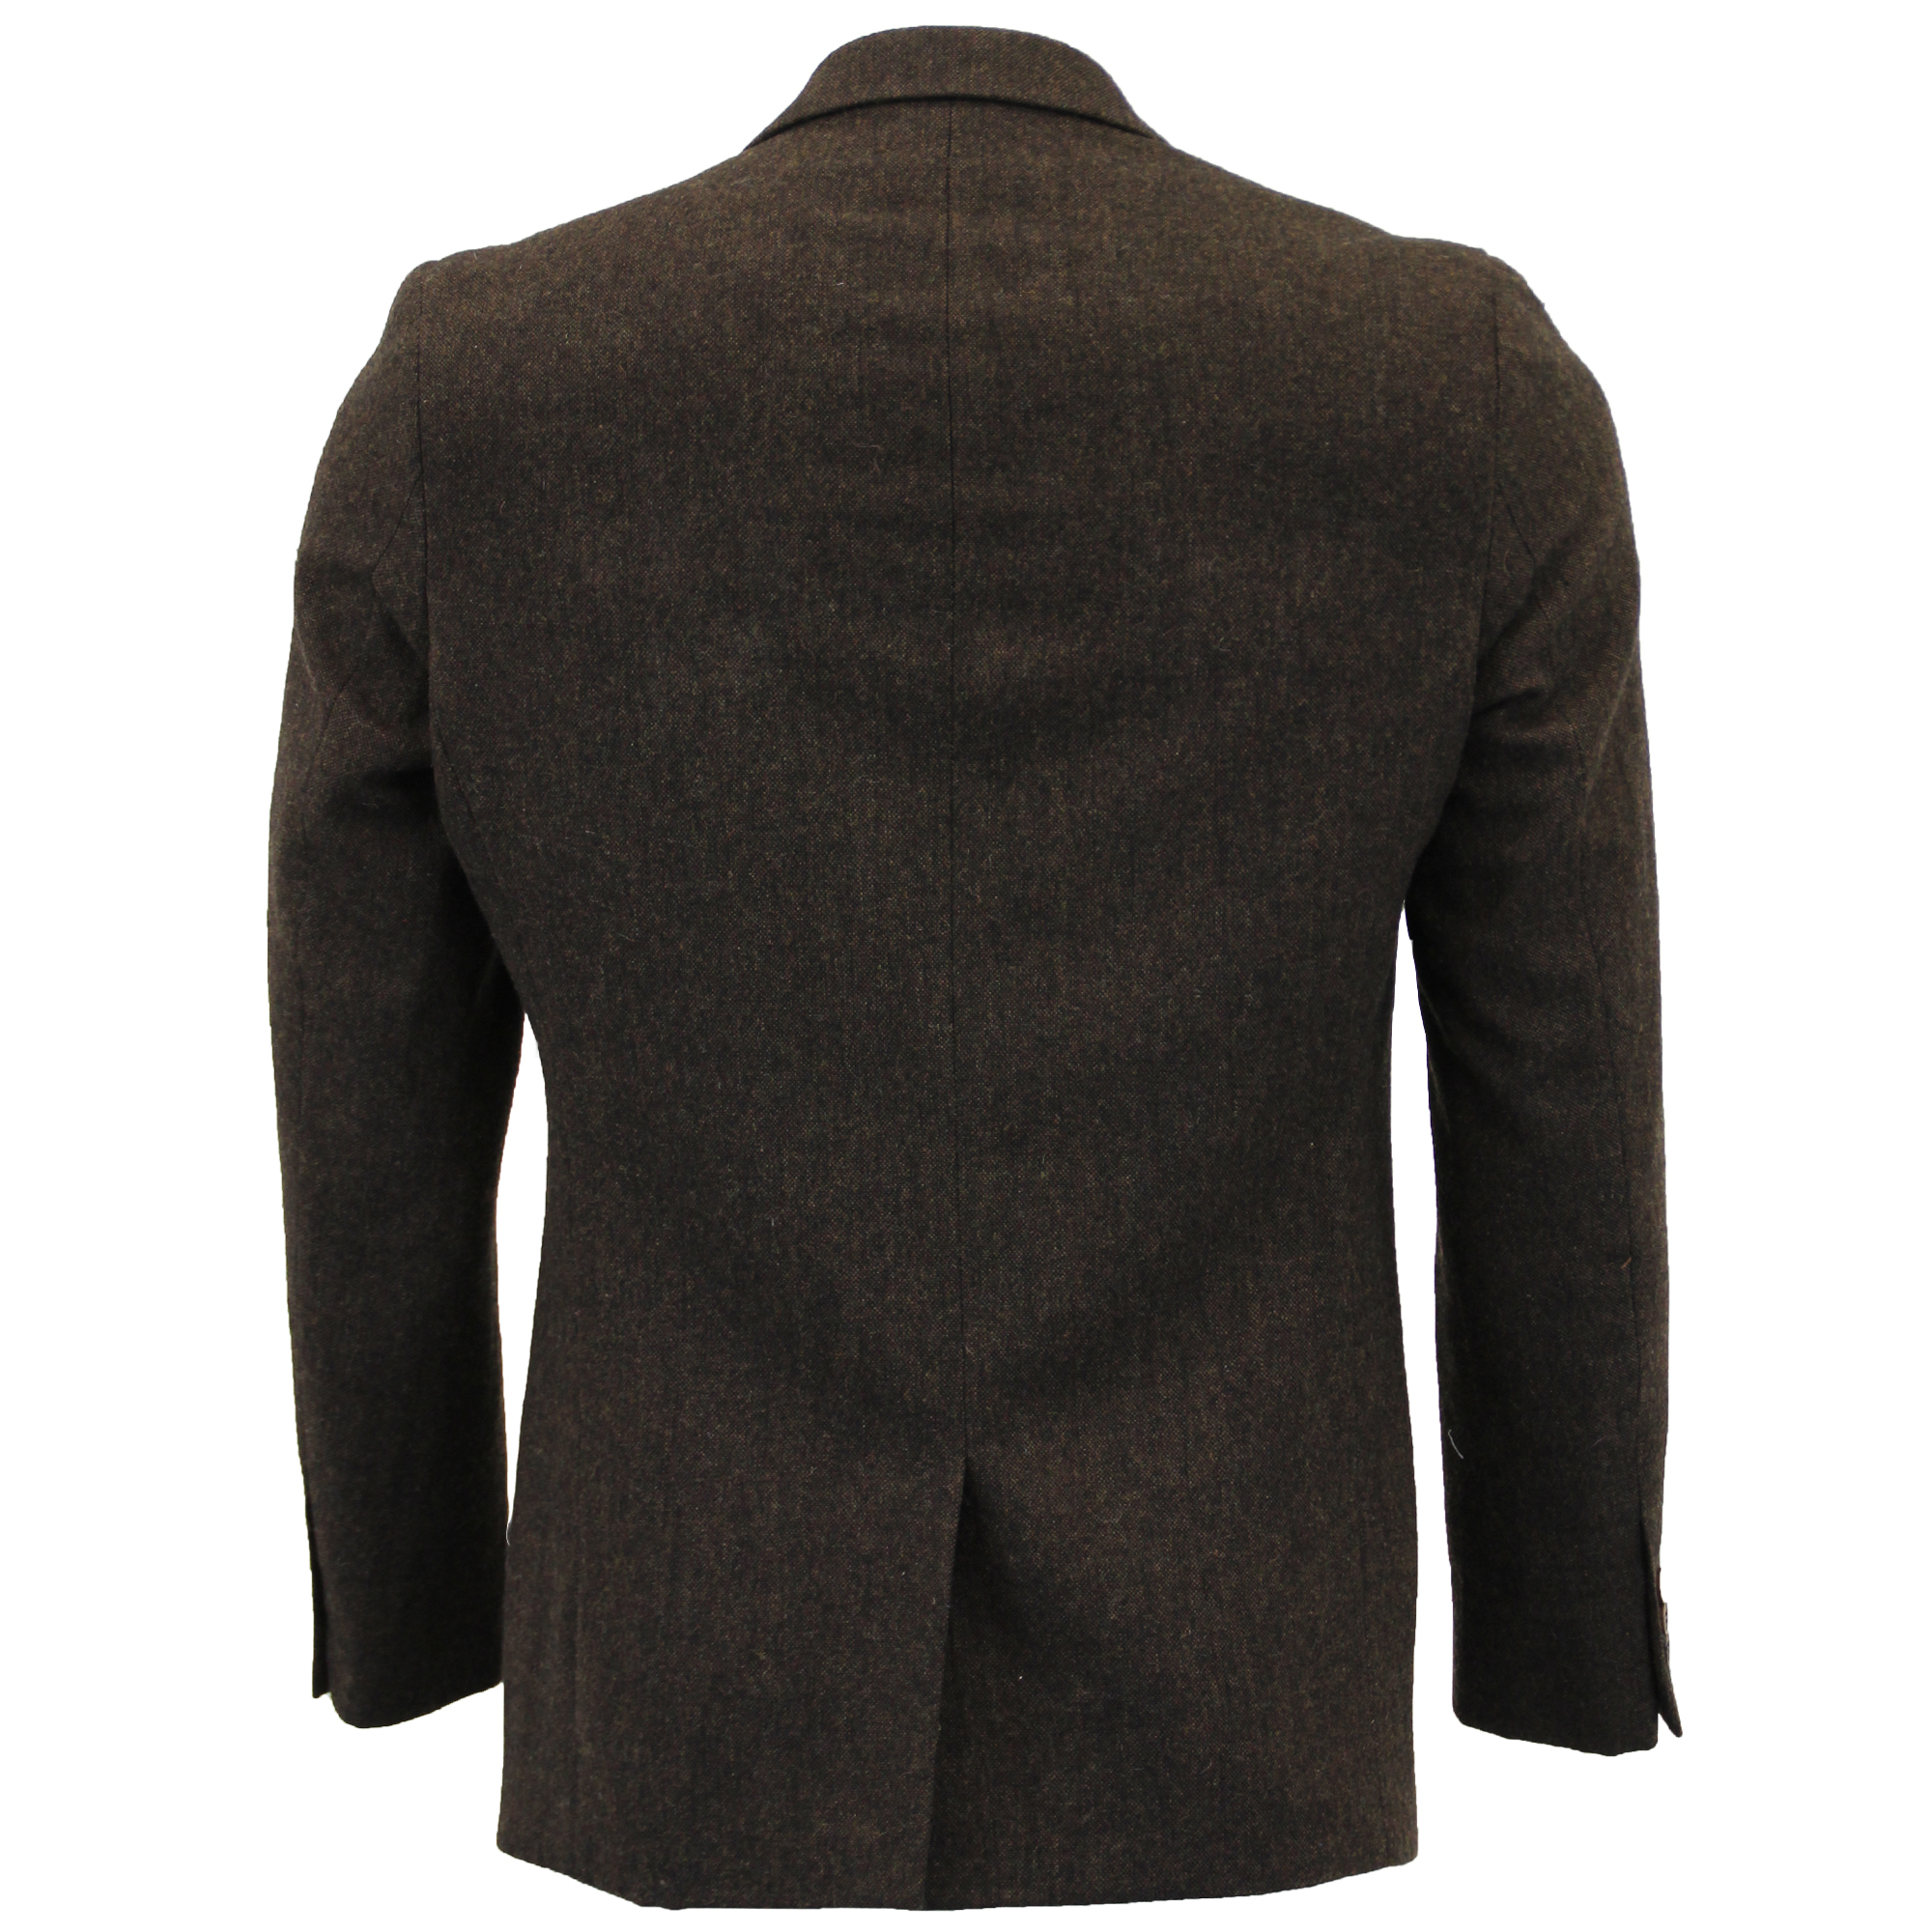 Mezcla-de-lana-para-hombre-3-piezas-trajes-mareno-Blazer-Chaqueta-pantalones-chaleco-Fiesta-Formal miniatura 4